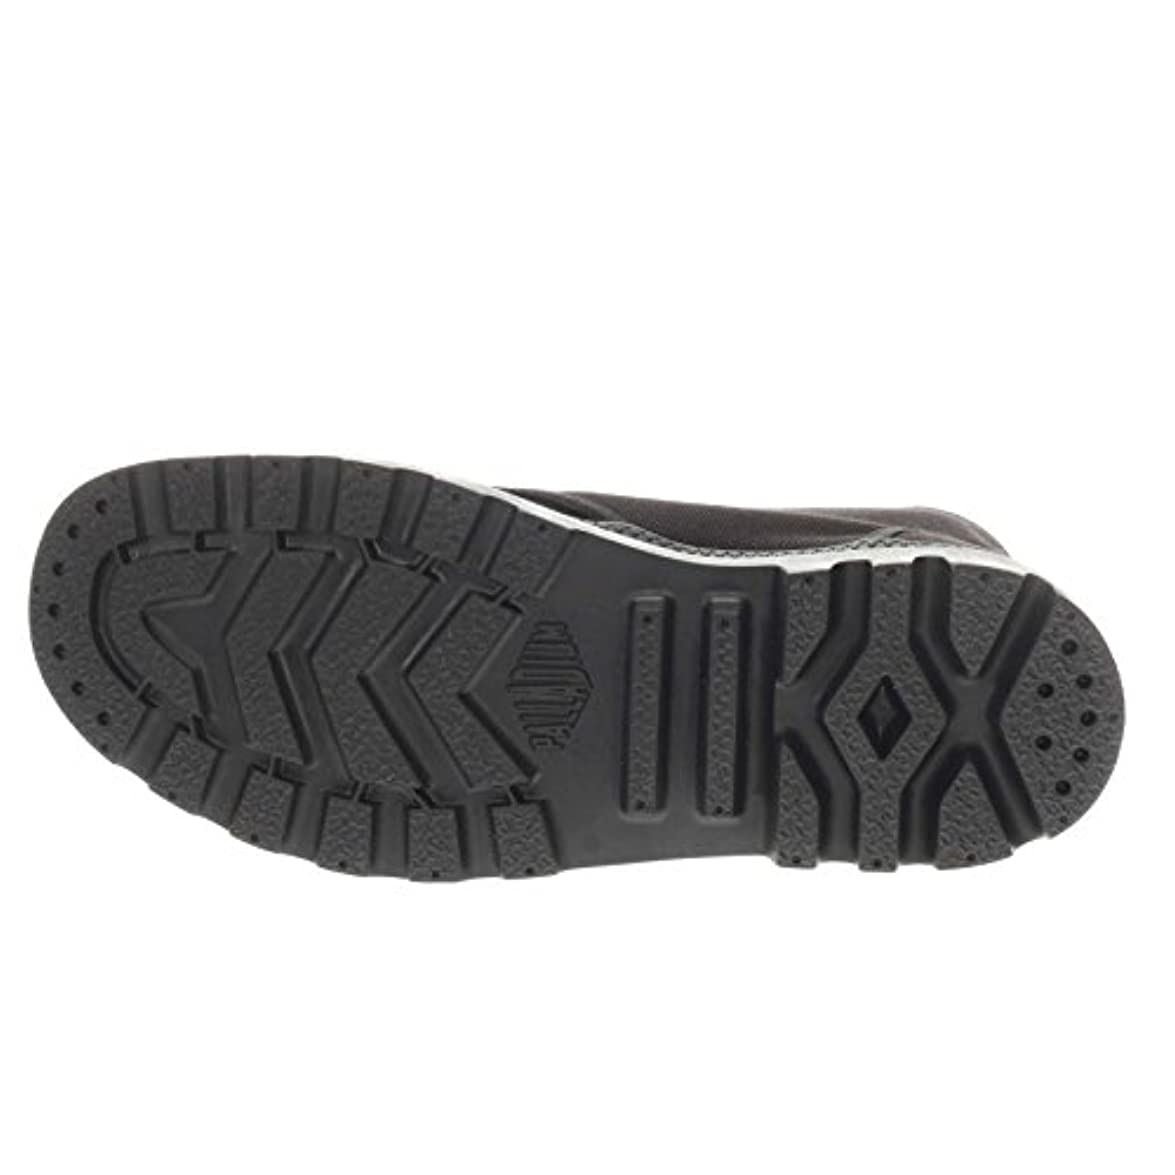 Palladium Uomo Sneaker Alta Pacal0002 P060 Pampa In Tessuto